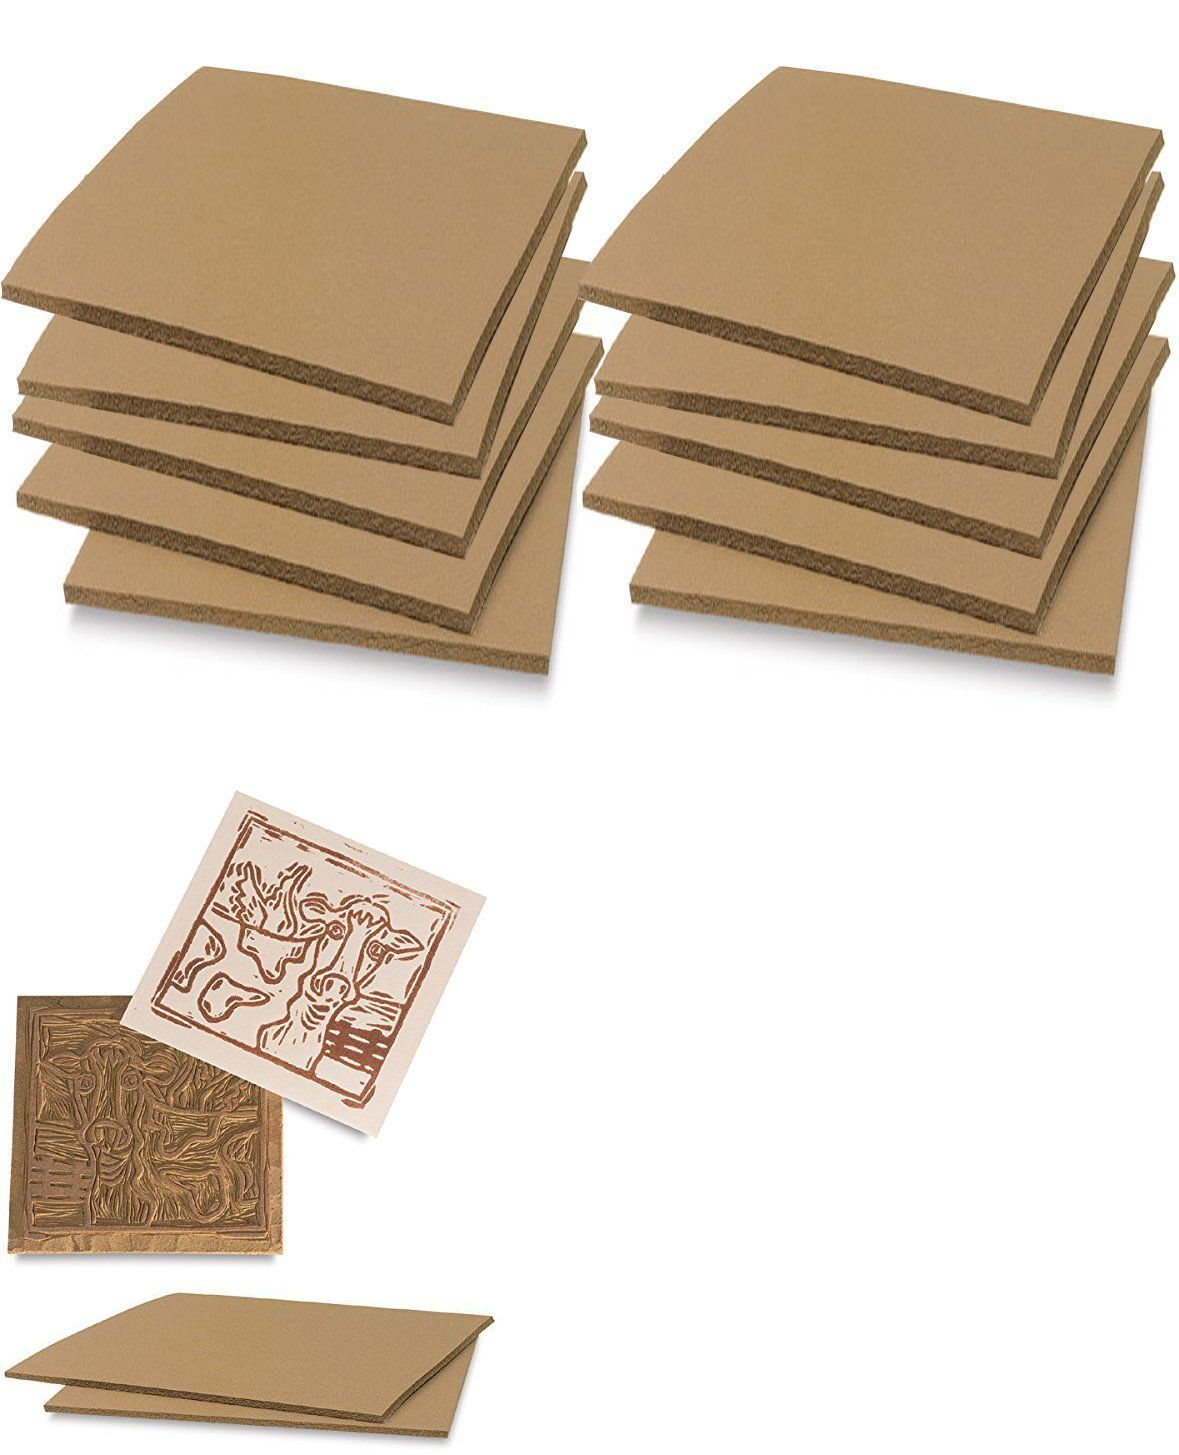 Linoleum 183109 Soft Cut 10 Pack Printmaking Carving Sheet Block Art Printing Sheets